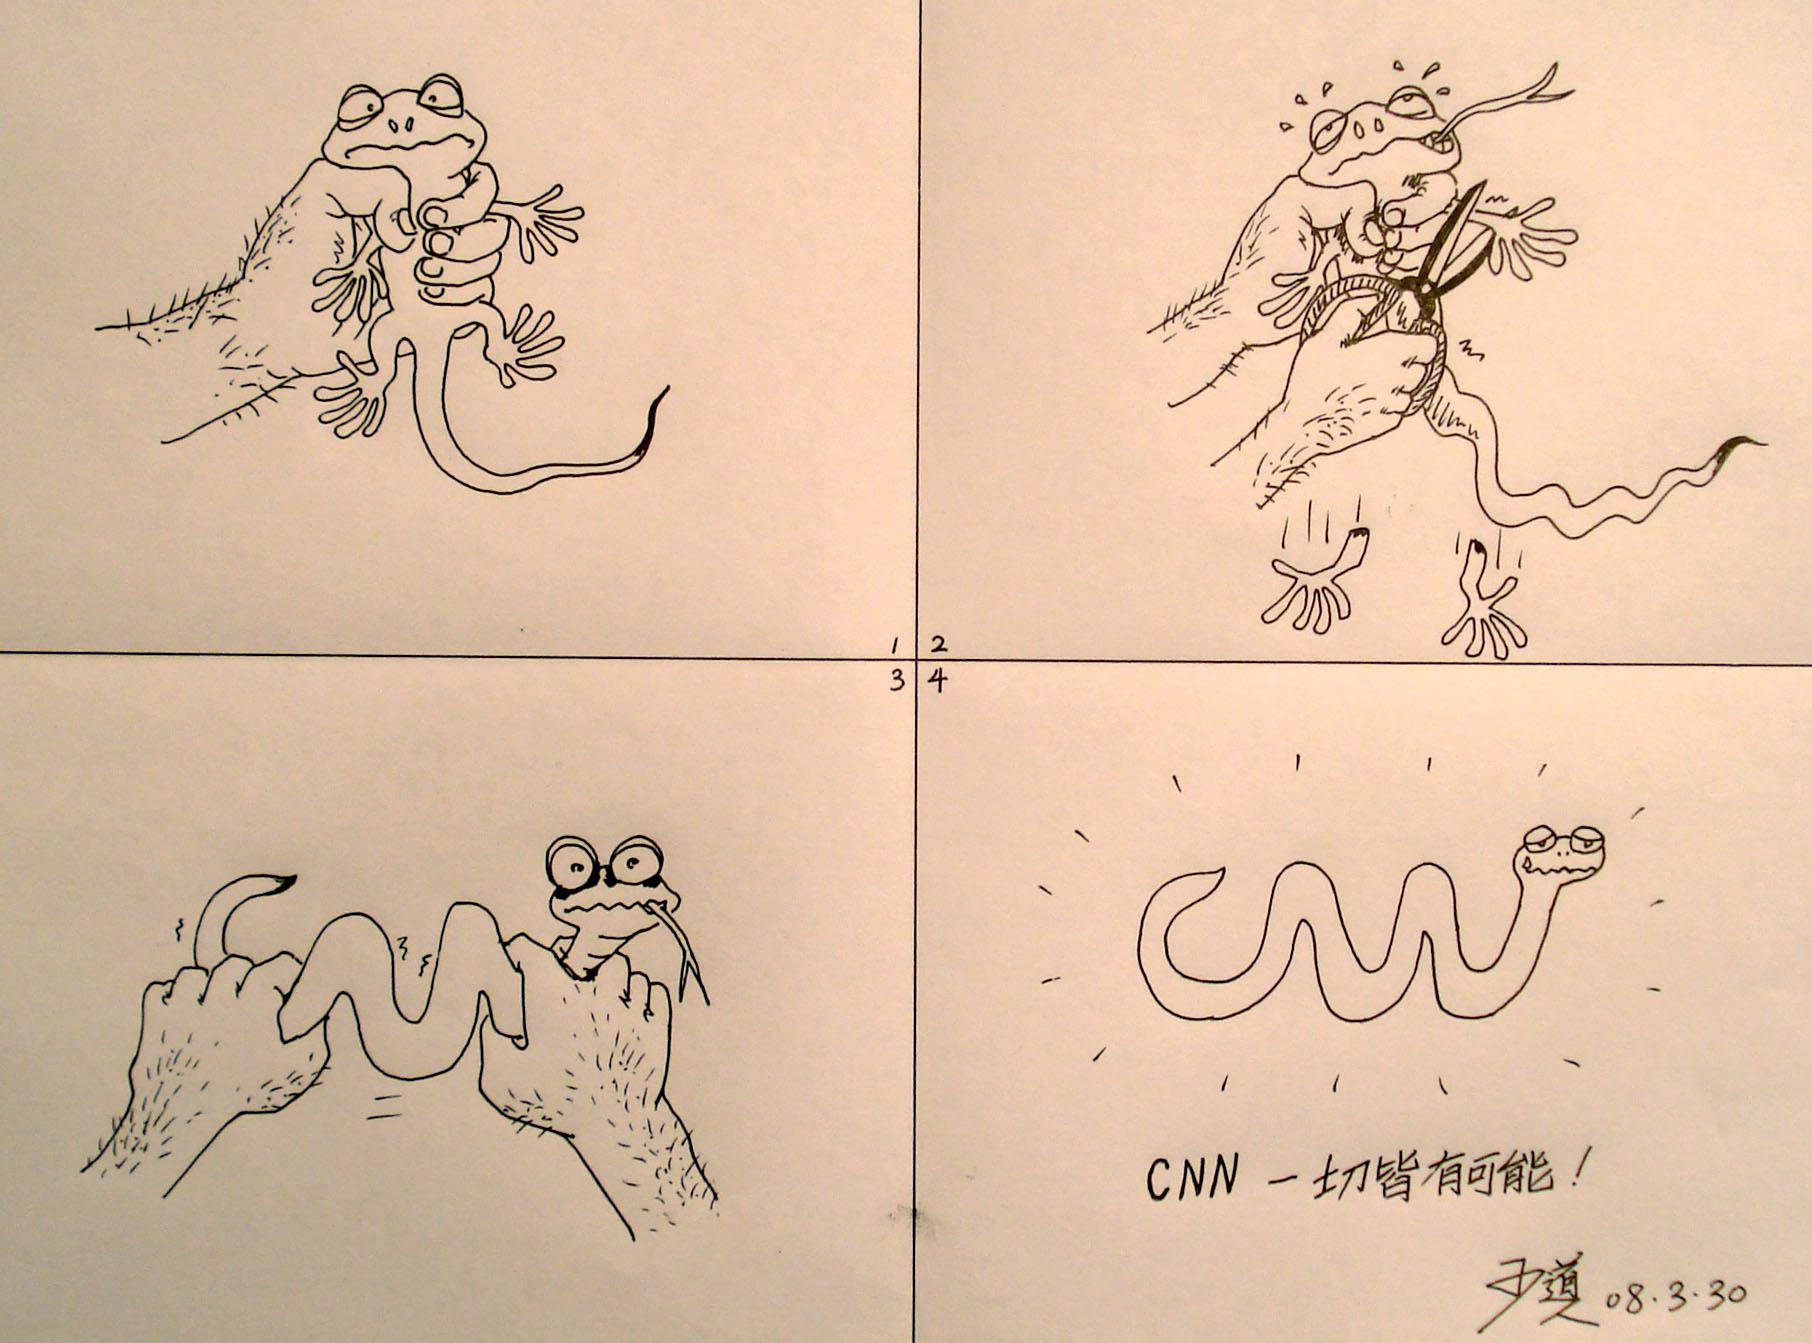 CNN frog